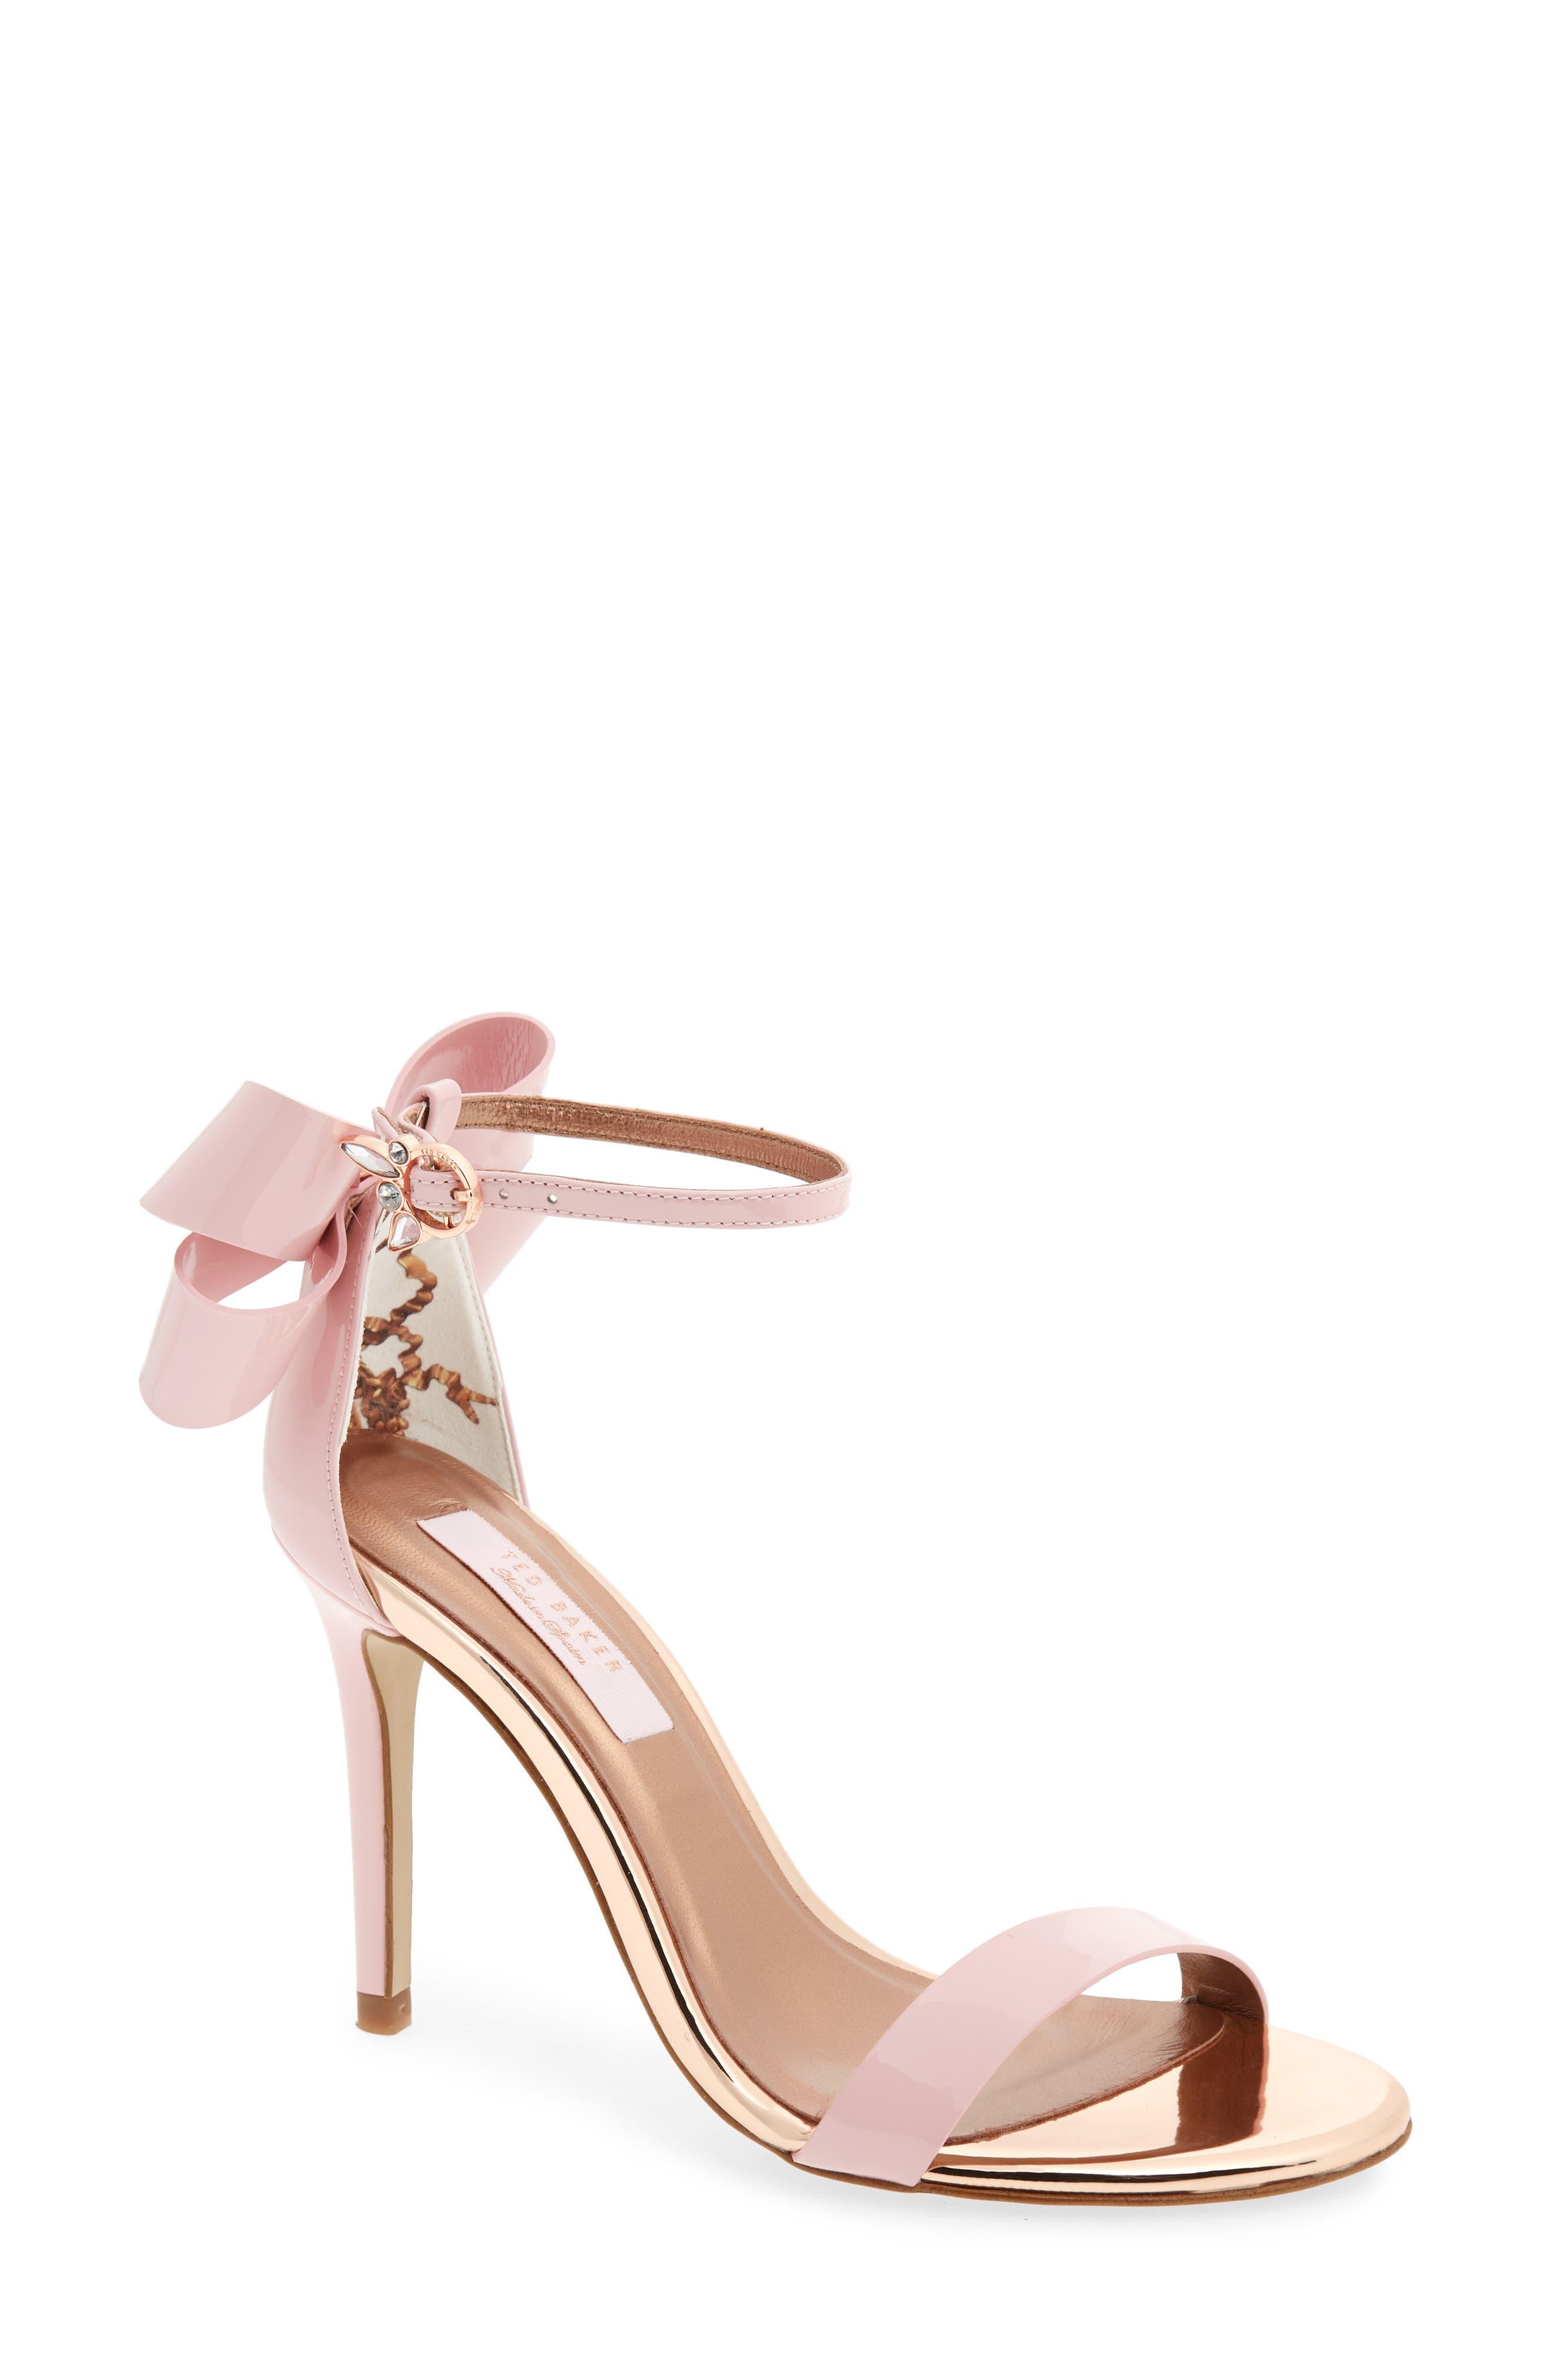 Sandalo Sandal,                         Main,                         color, Light Pink Leather